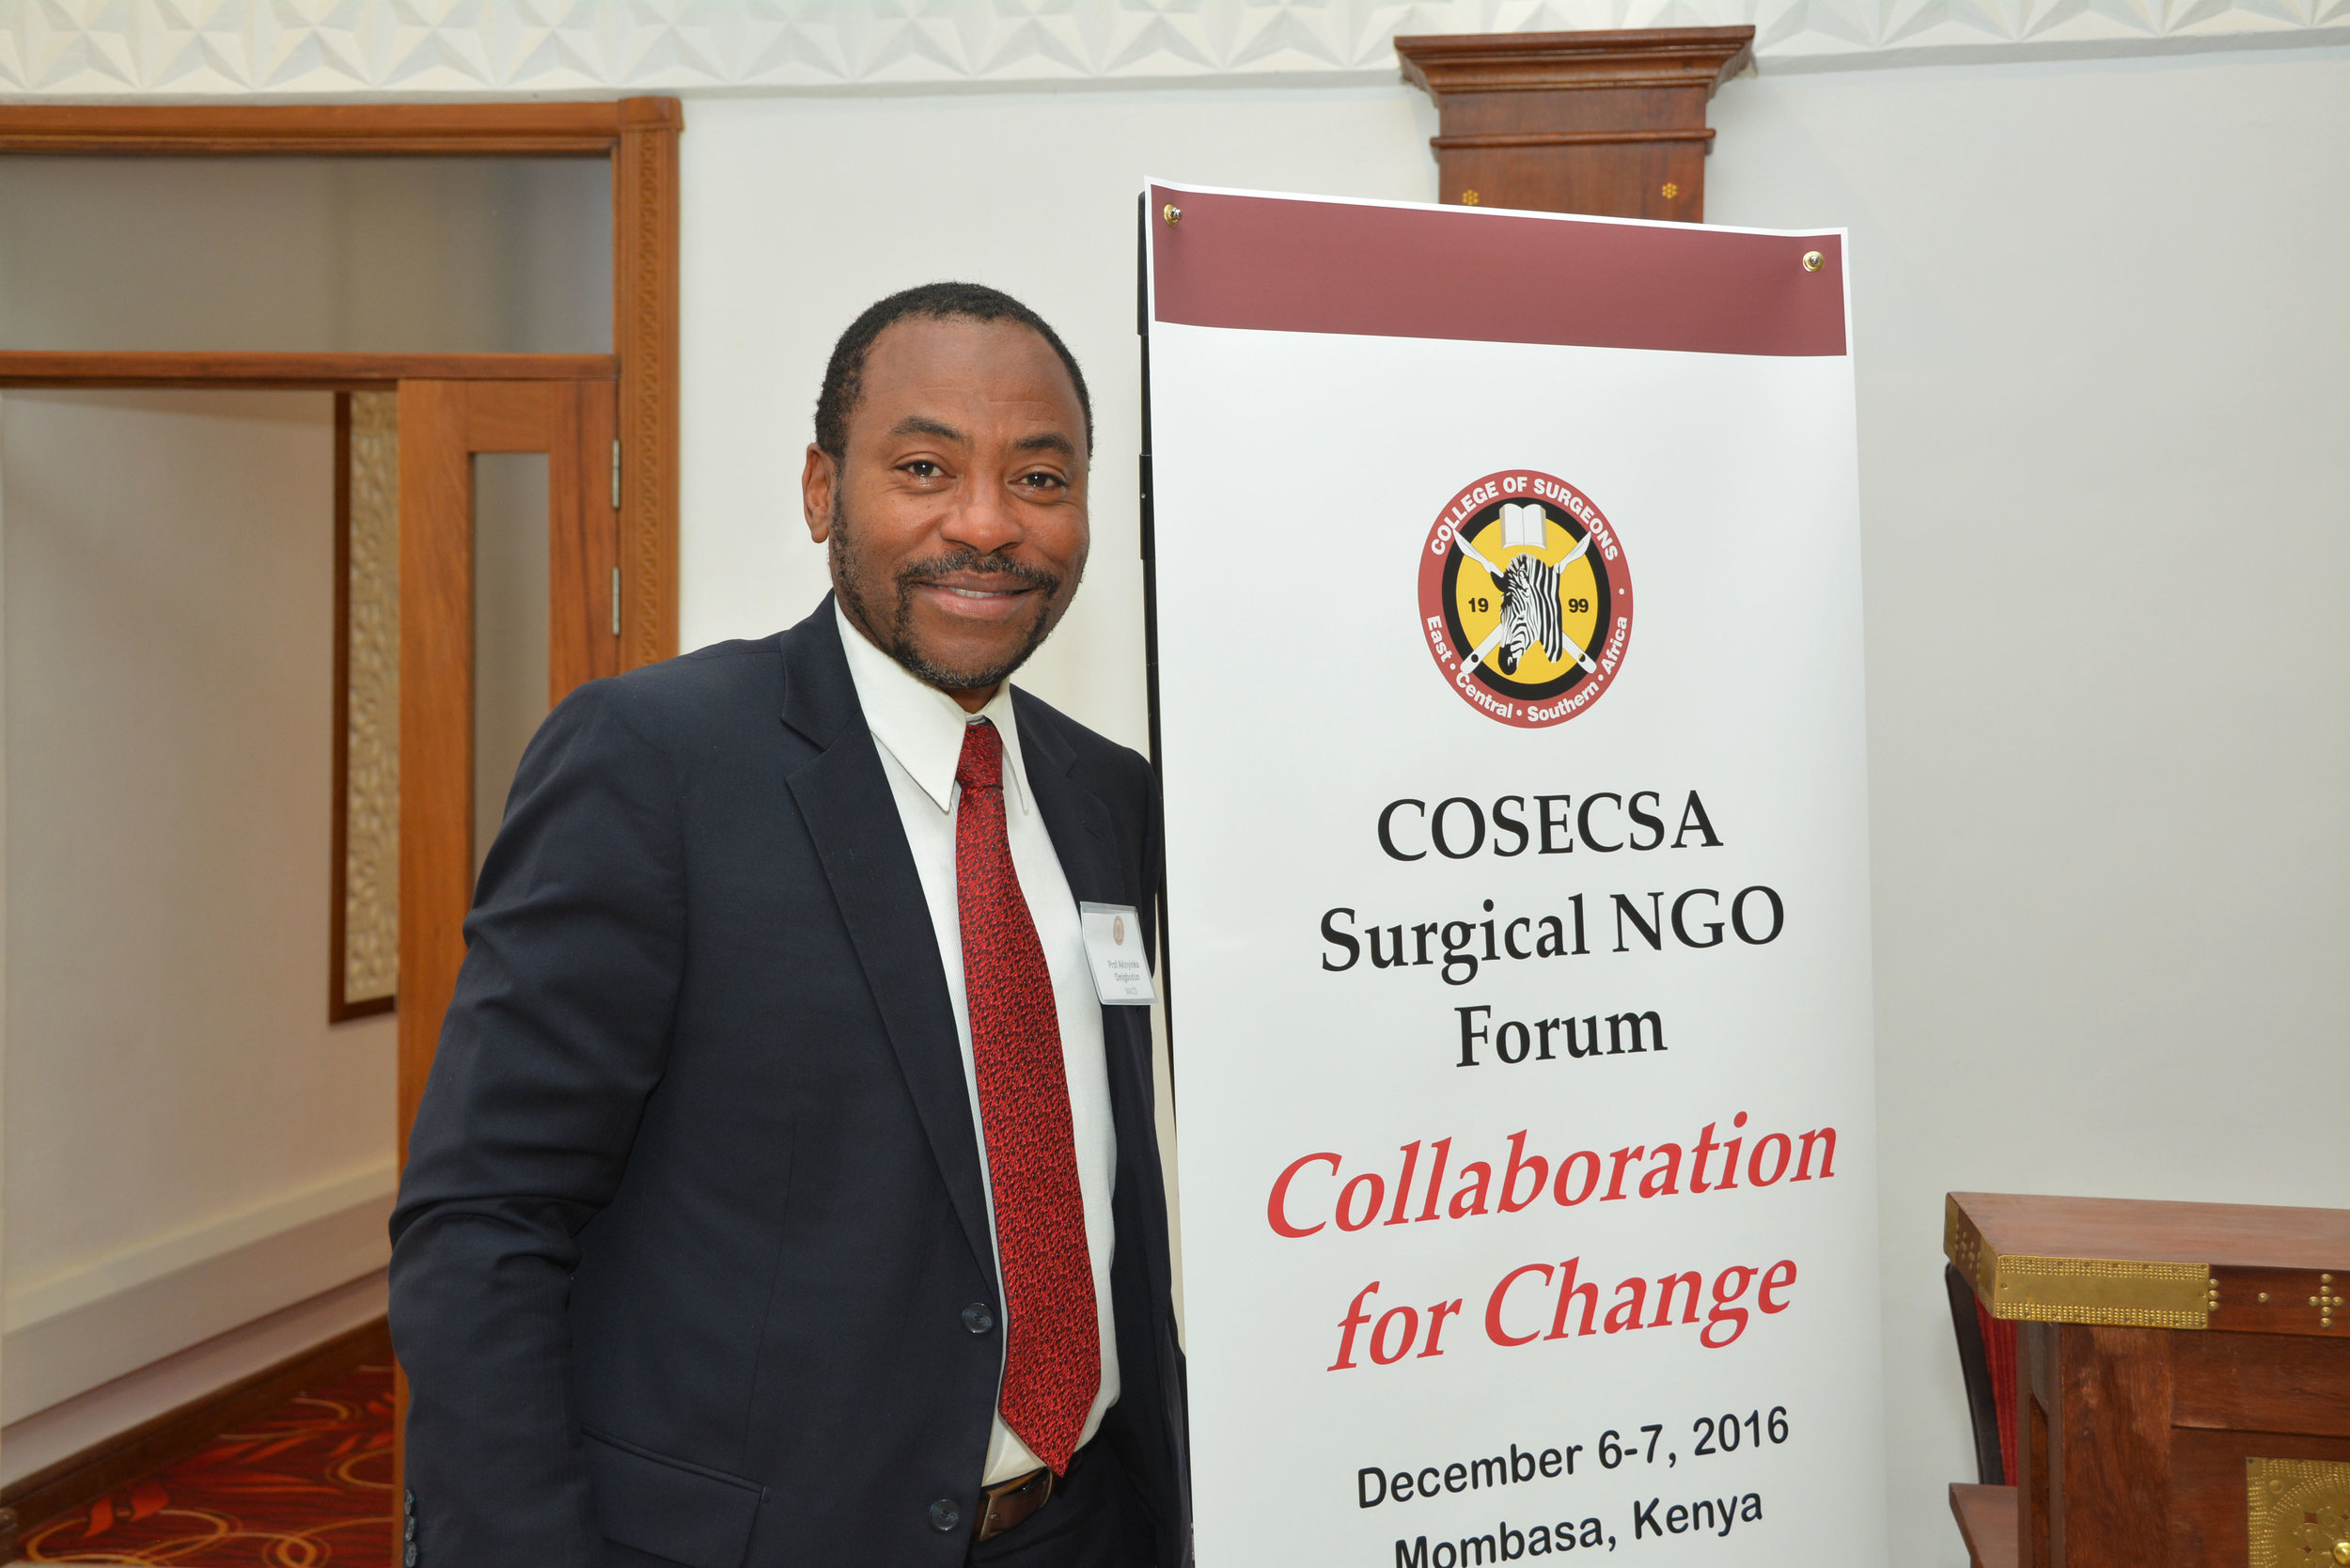 COSECSA Surgical NGO Forum (2).JPG